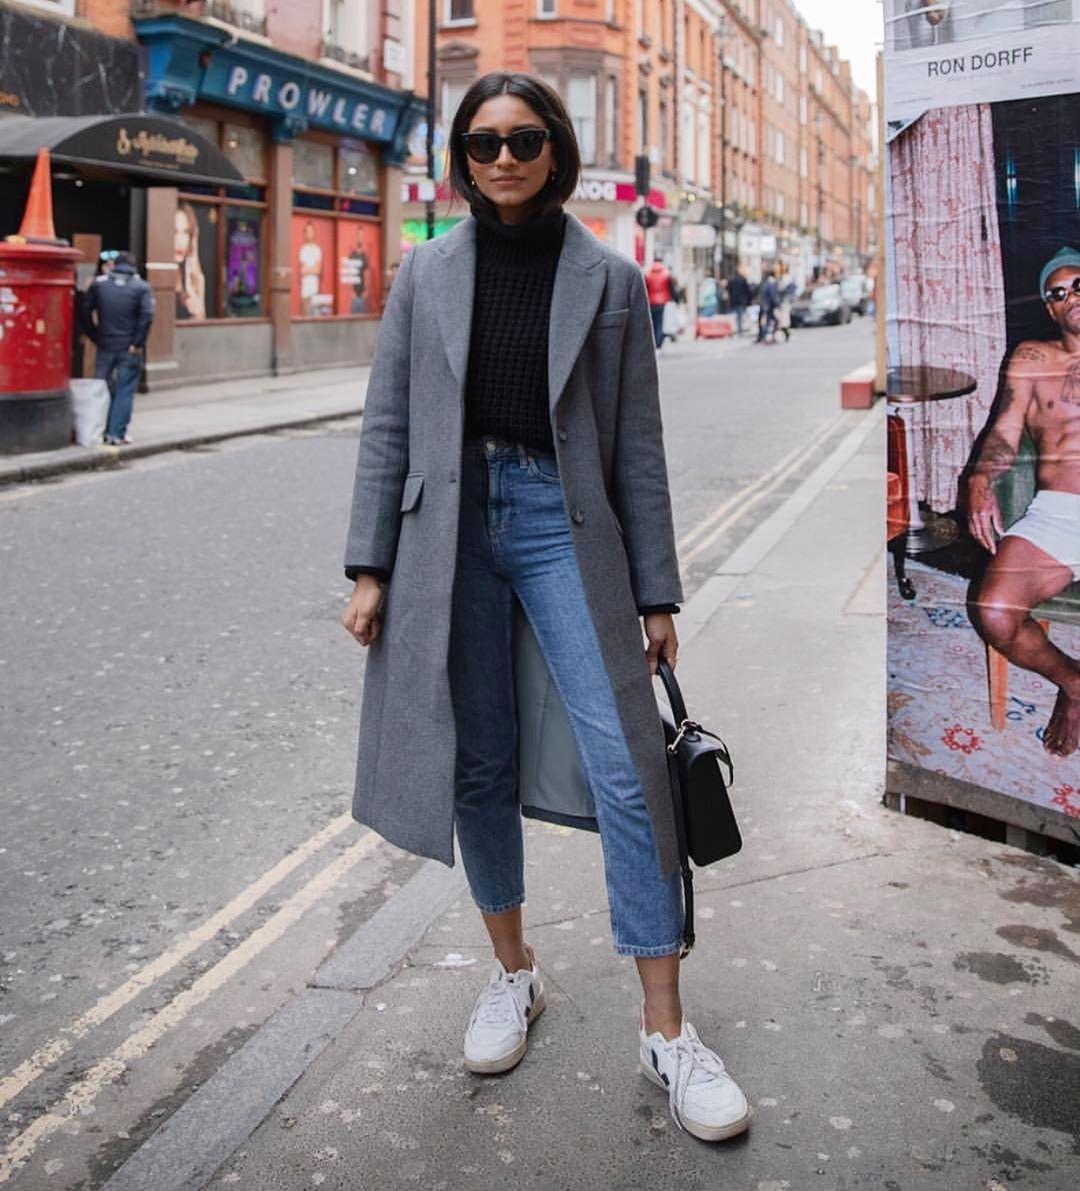 coat long coat wool coat h&m white sneakers straight jeans topshop black sweater turtleneck sweater black bag sunglasses